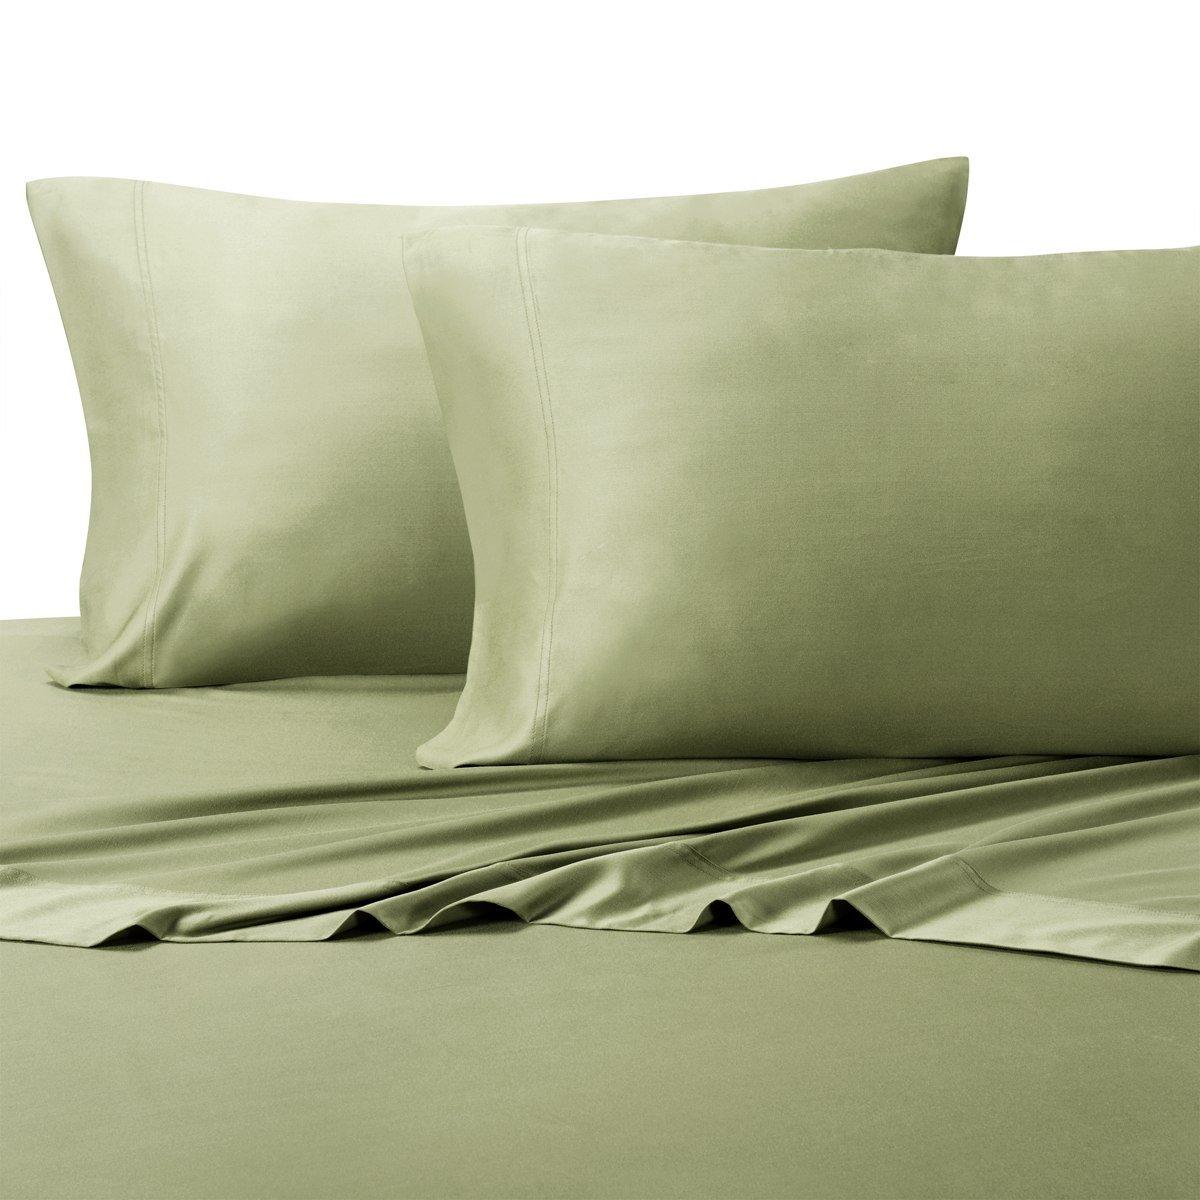 Royal Tradition 100 Percent Bamboo Bed Sheet Set, Twin Extra Long XL, Solid Sage, Super Soft and Cool Bamboo Viscose 3PC Sheets